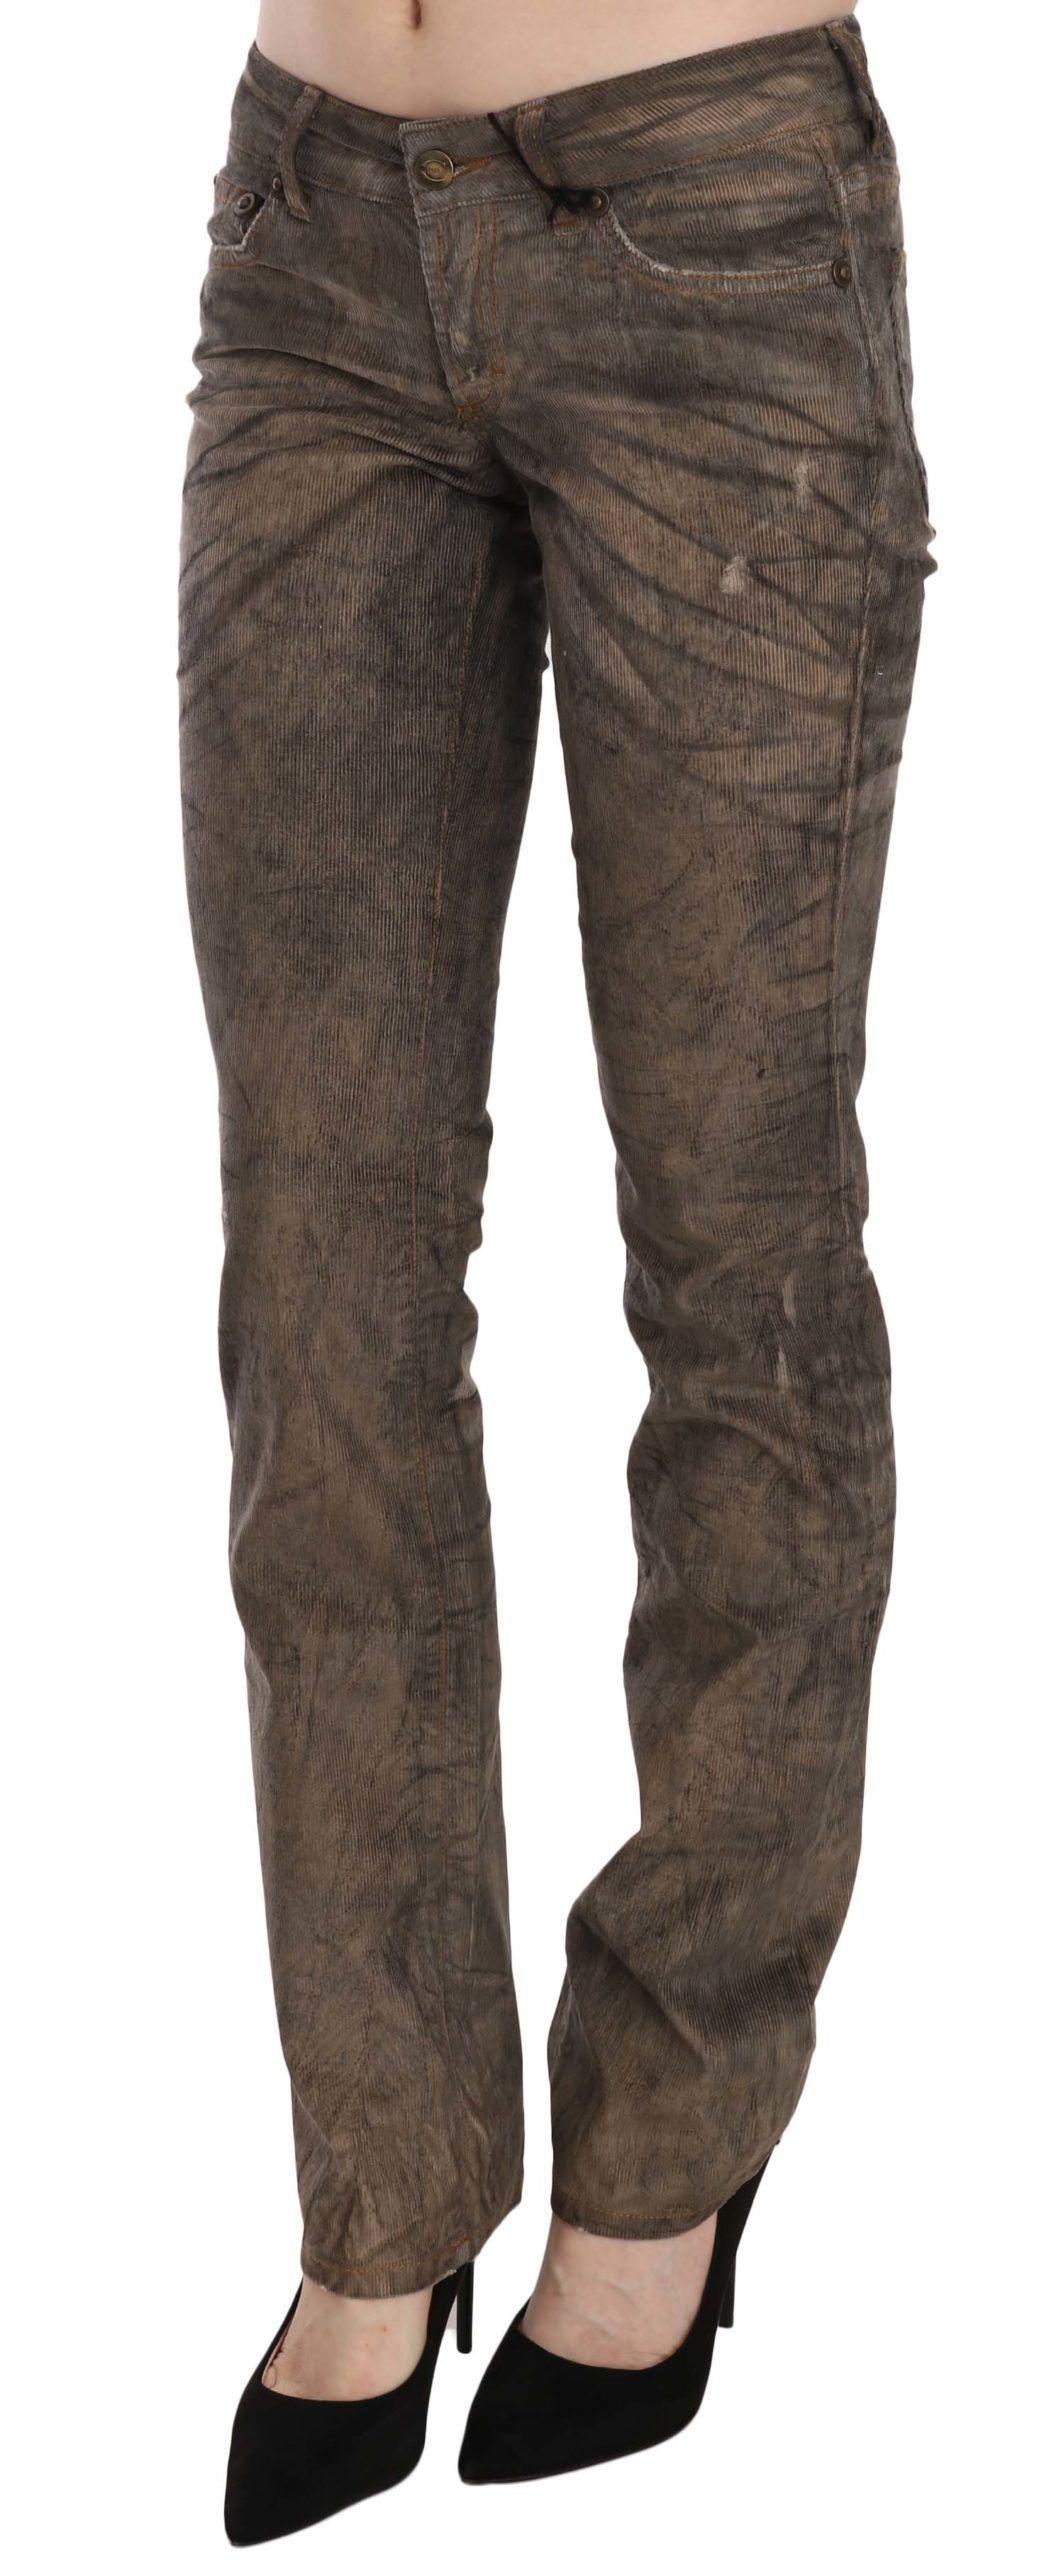 Just Cavalli Brown Corduroy Low Waist Slim Fit Denim Pants Jeans